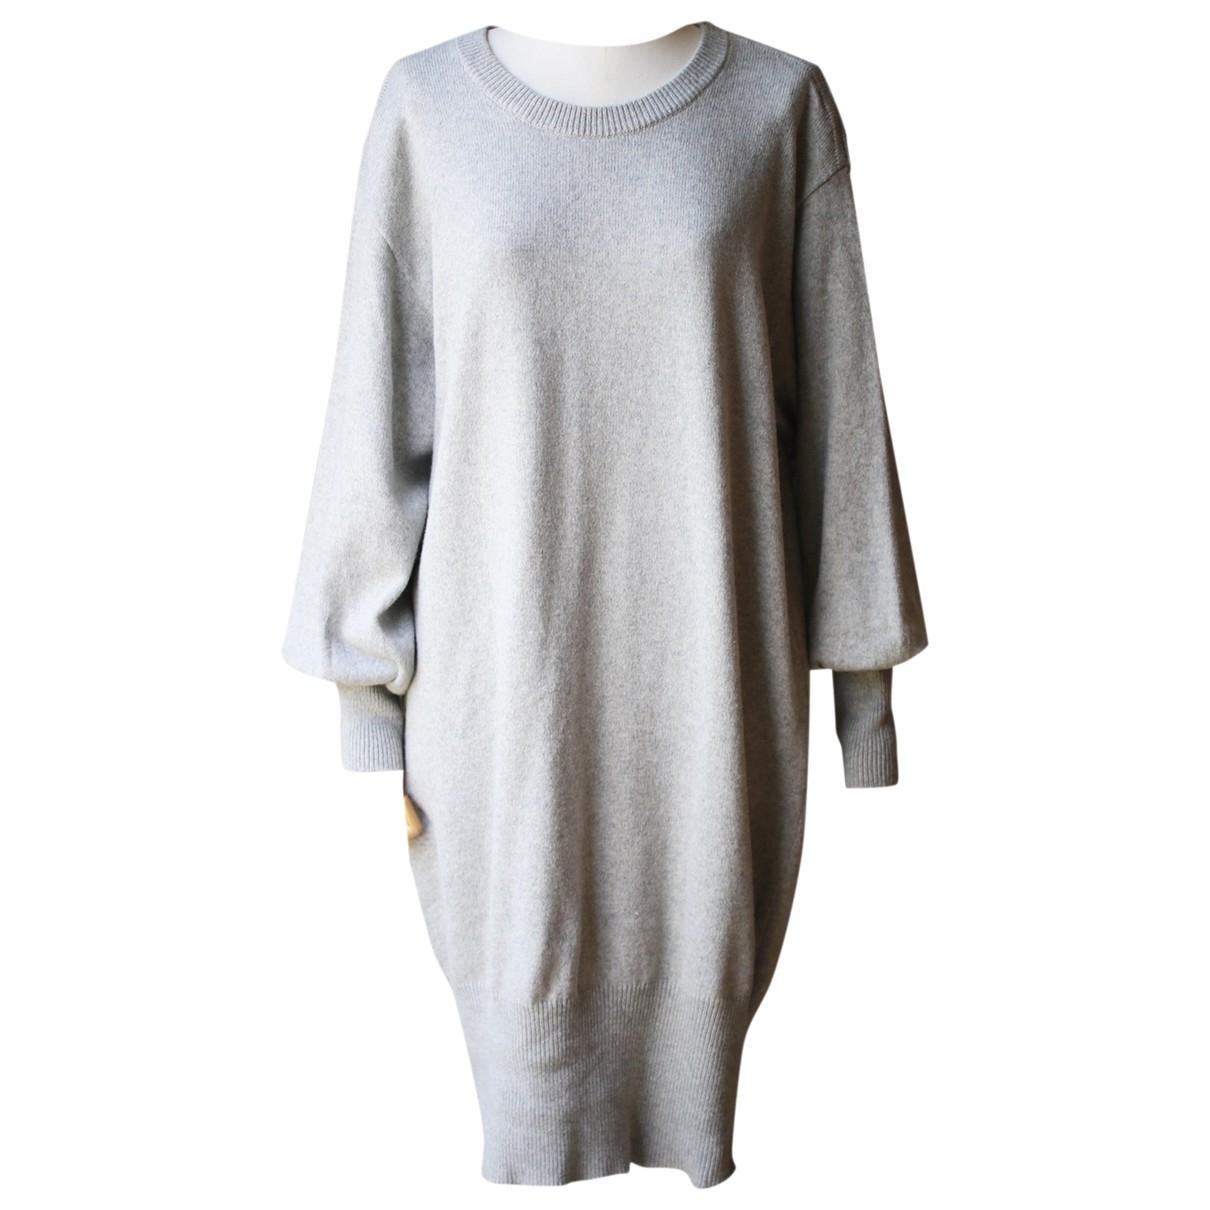 Autre Marque \N Kleid in  Grau Baumwolle